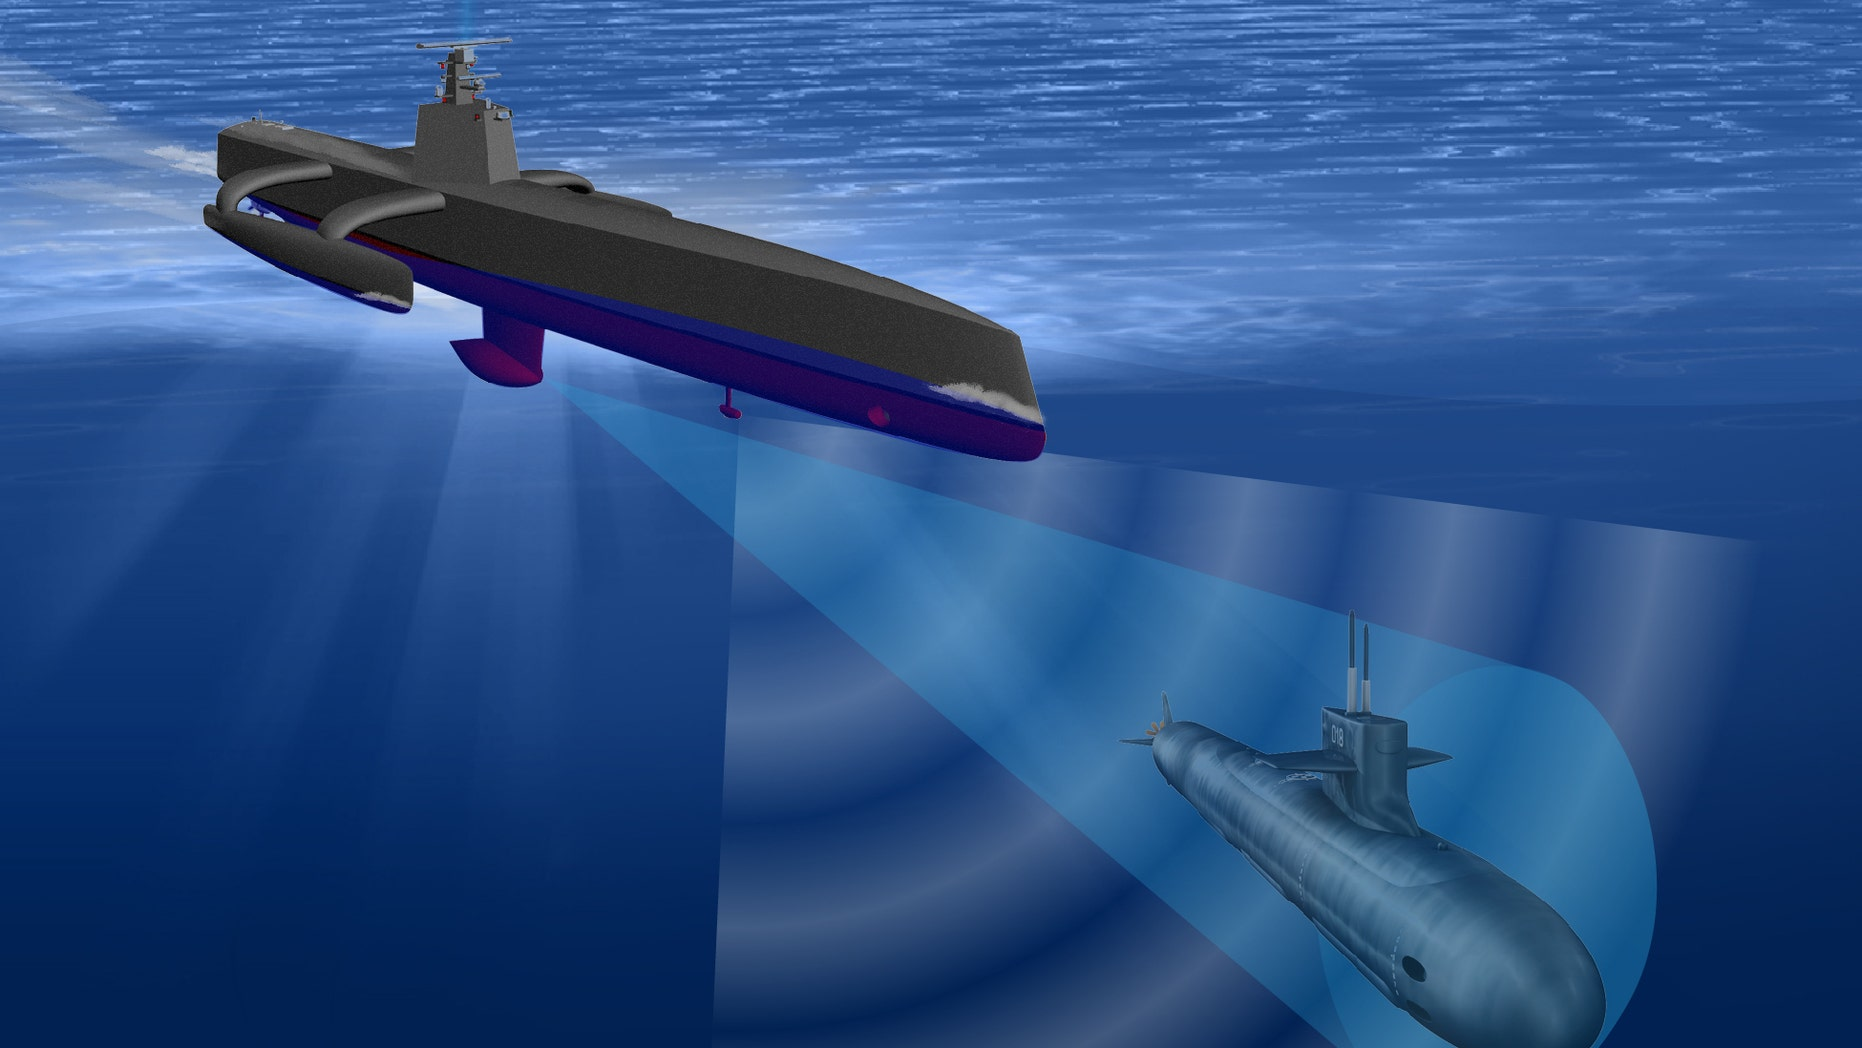 Illustration of DARPA's Anti-Submarine Warfare (ASW) Continuous Trail Unmanned Vessel (ACTUV)